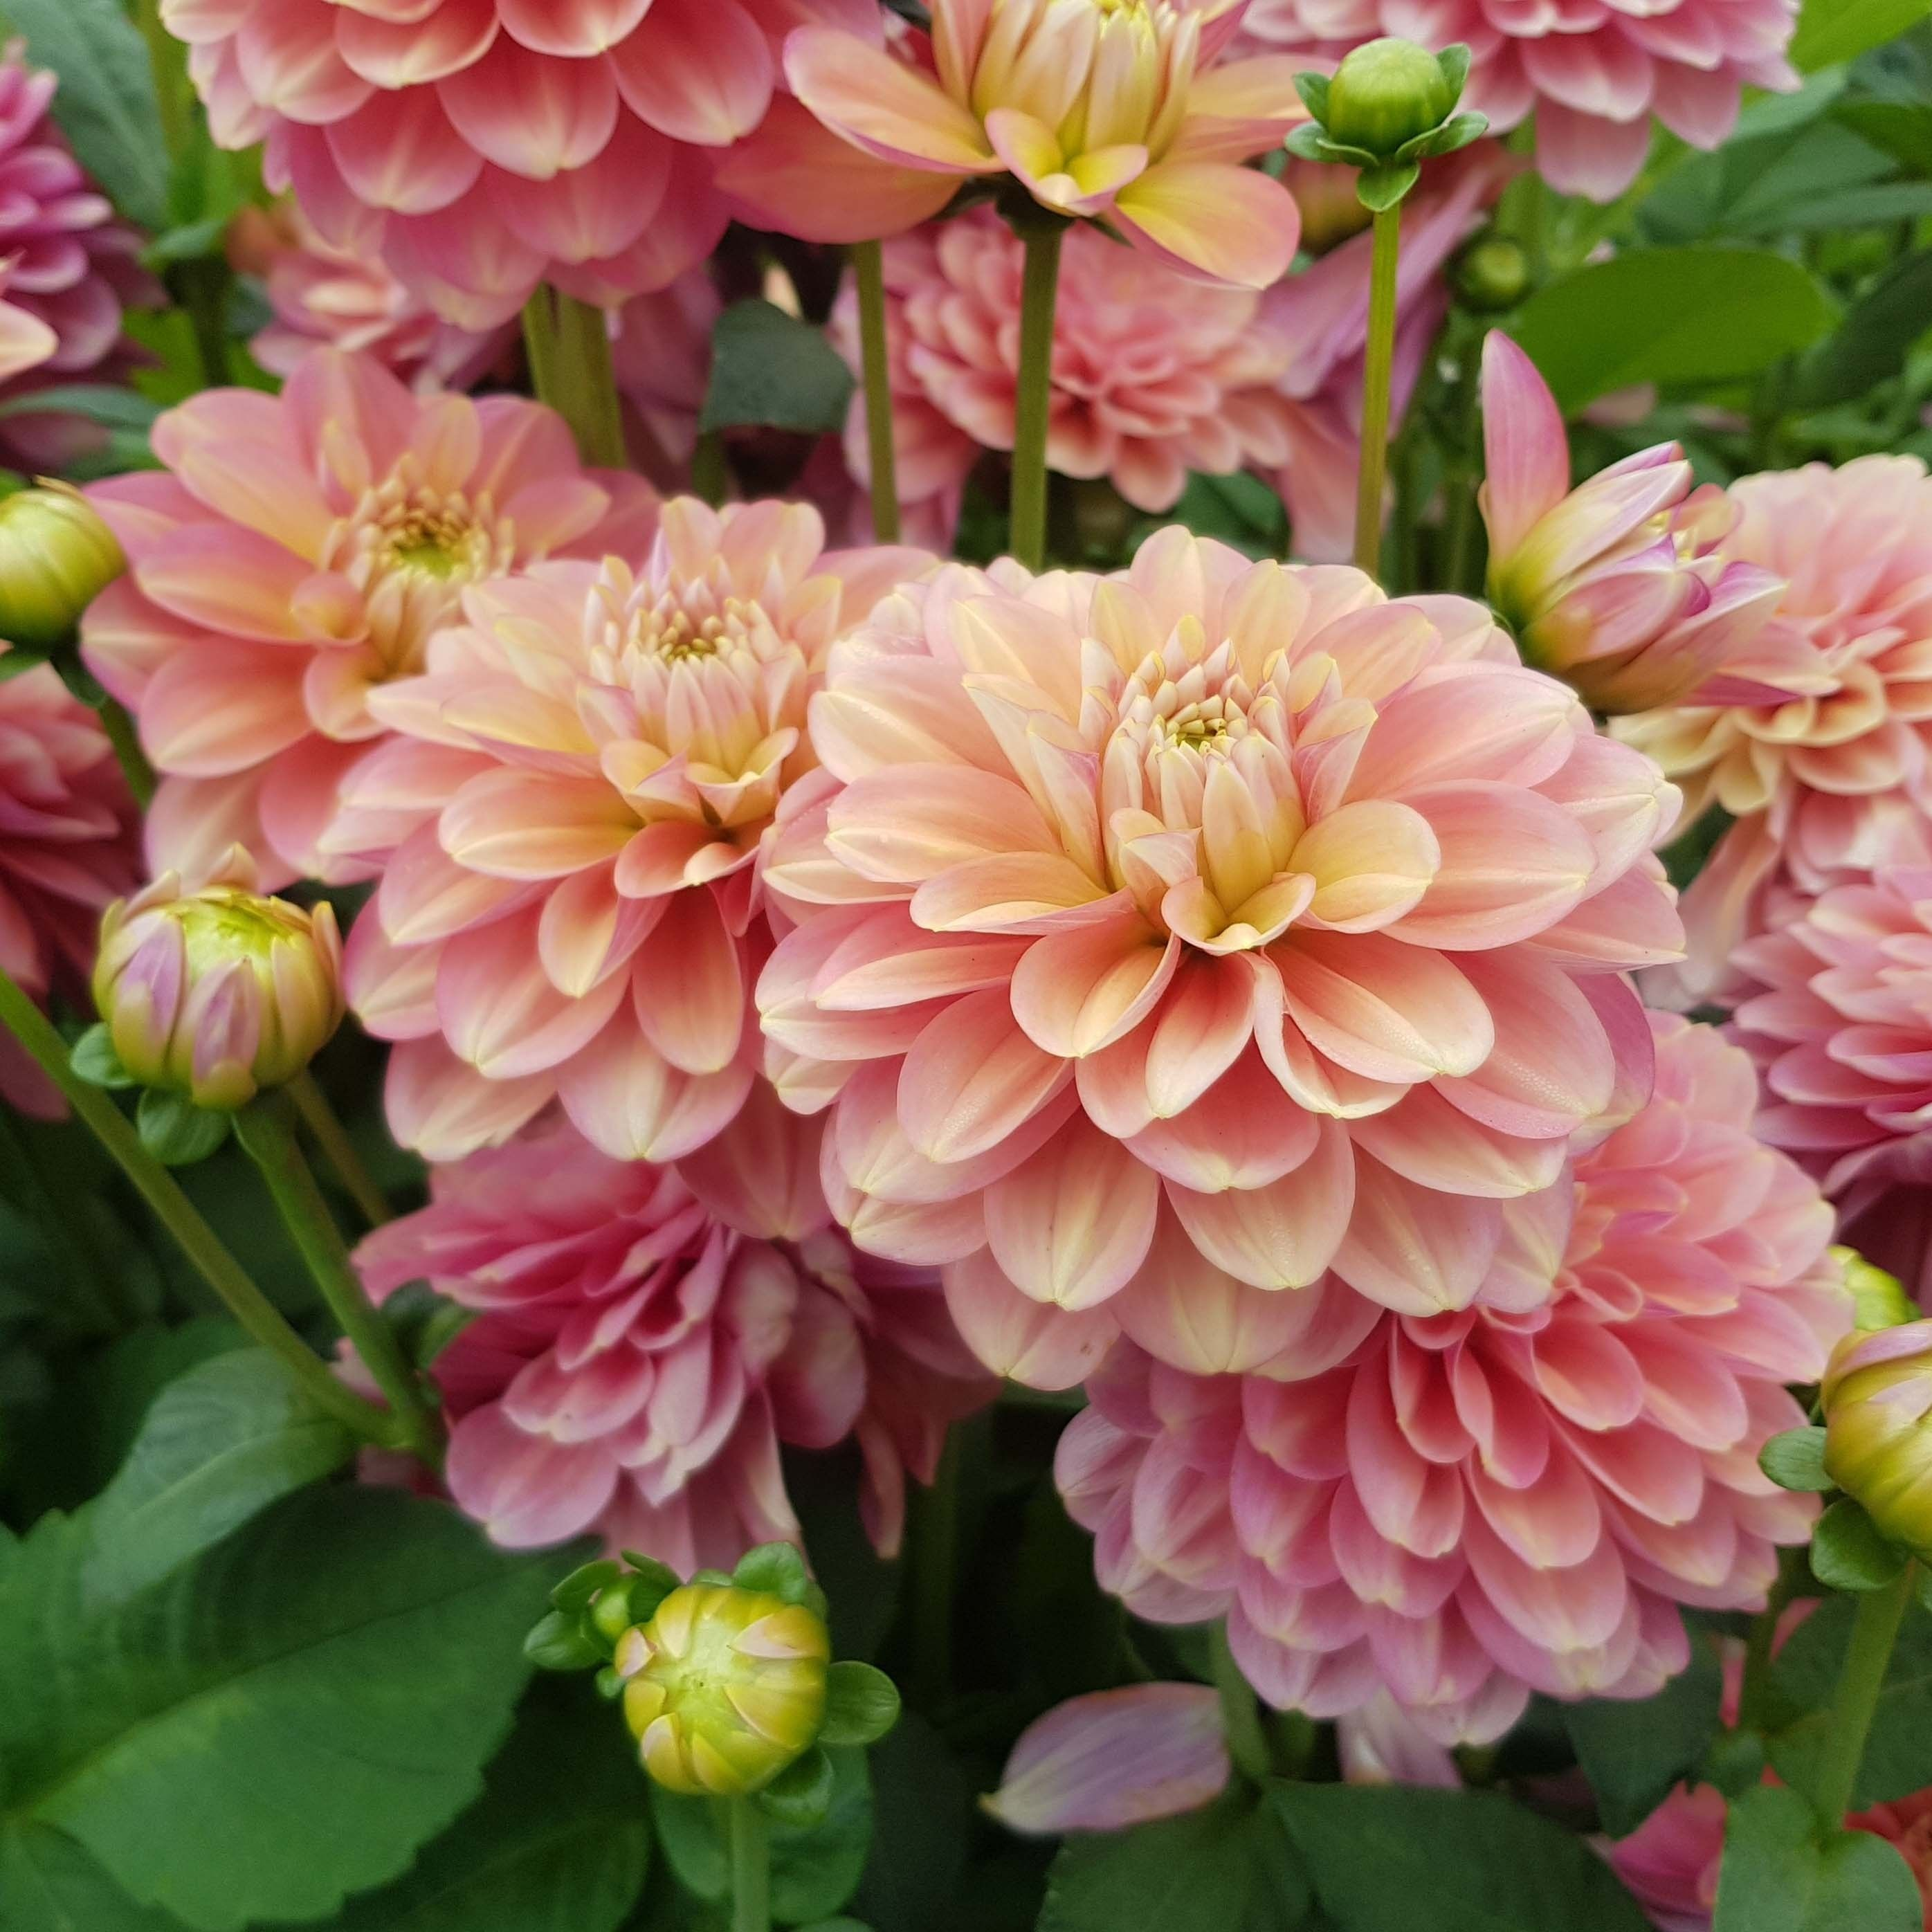 Dahlia 'Milena Fleur' | Dahlia, Flowers, Garden